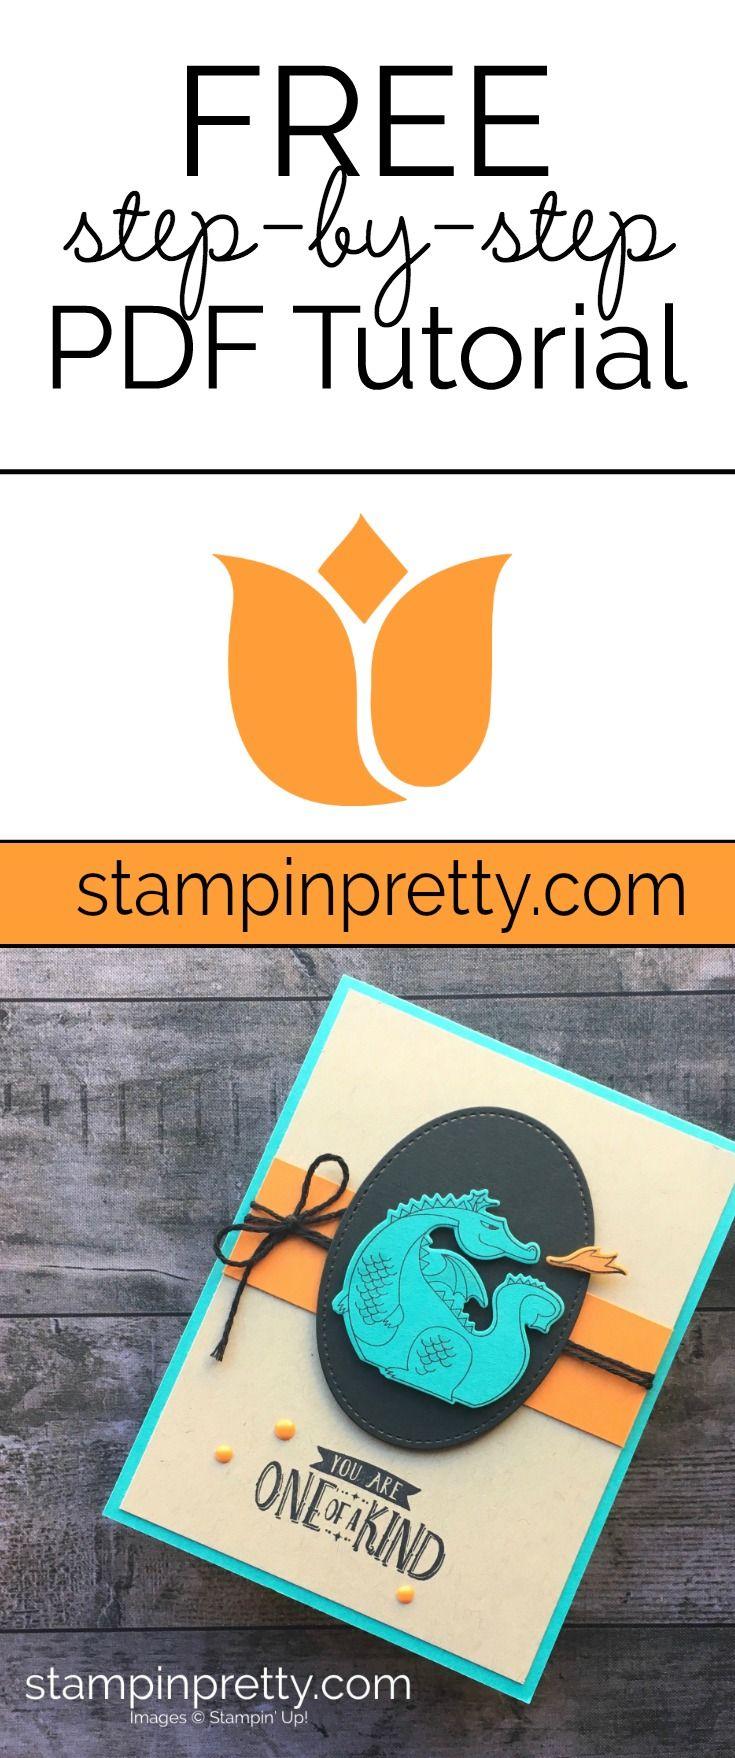 free stepbystep pdf tutorialmary fish showing how to